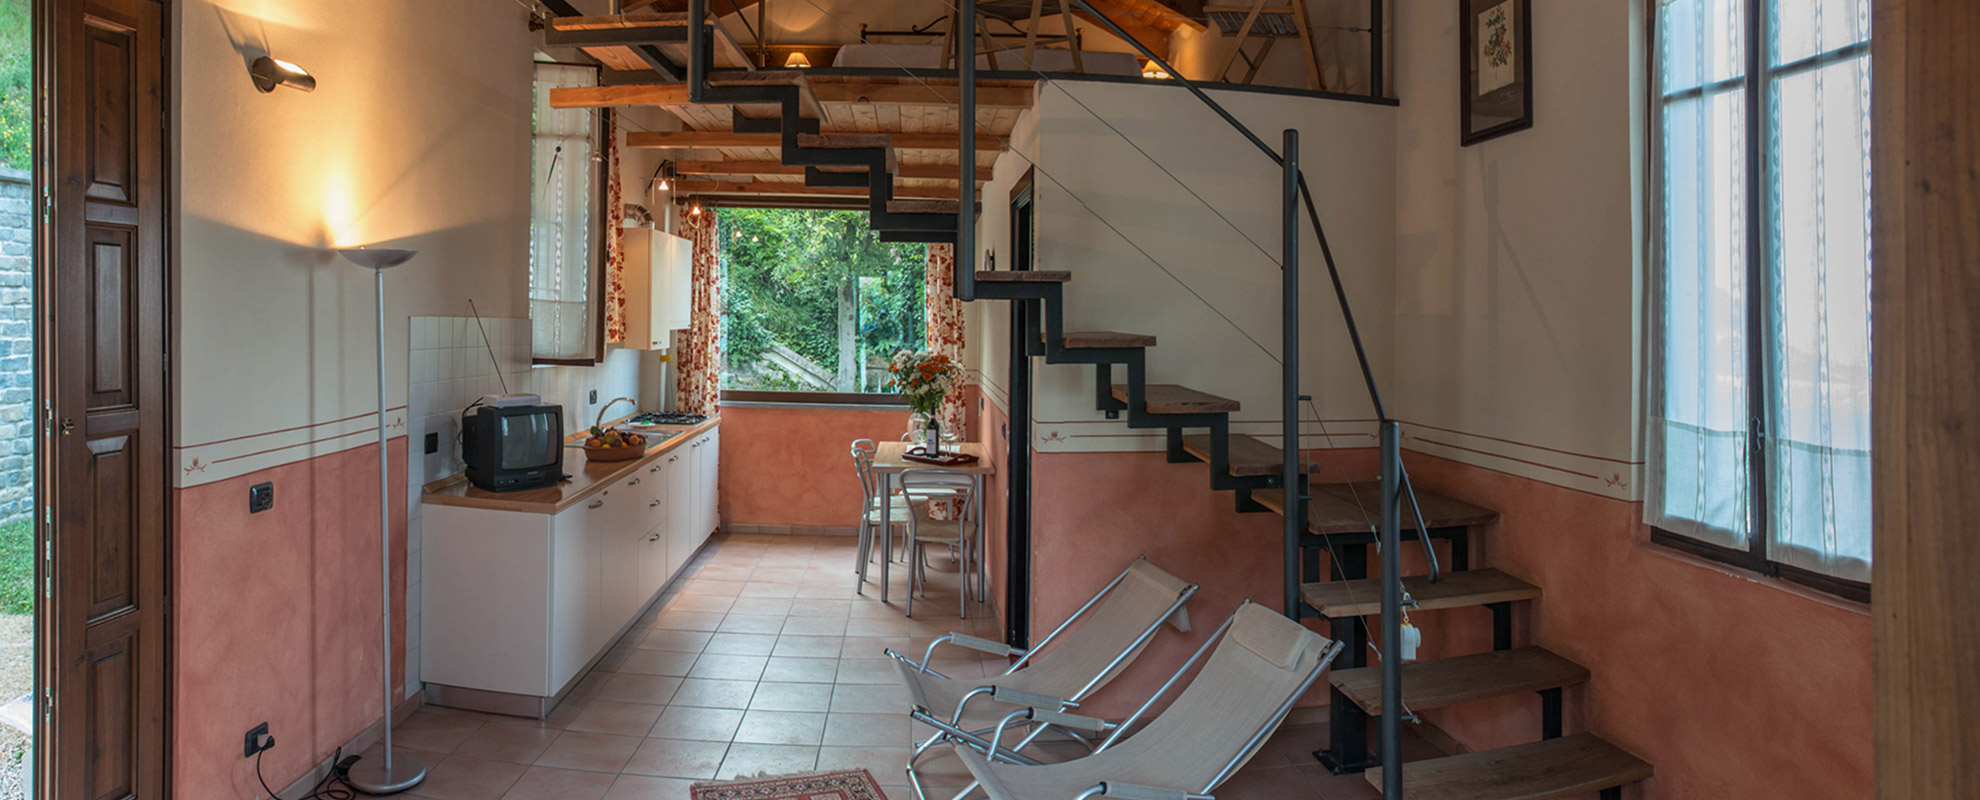 casetta-appartamento-langhe